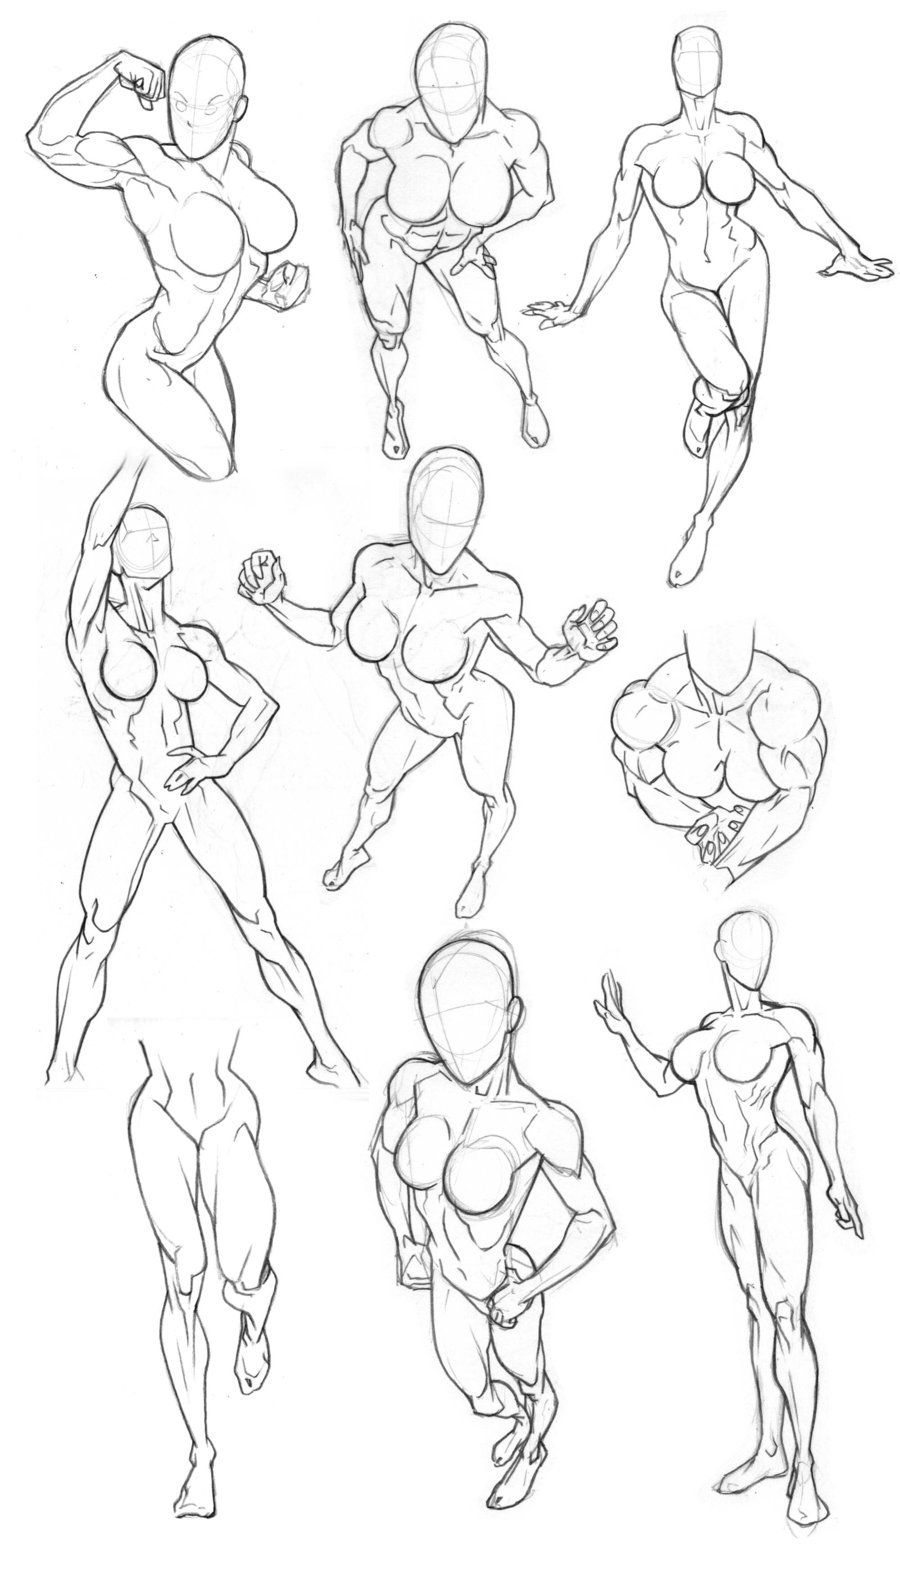 Sketchbook Figure Studies 2 by Bambs79.deviantart.com on @deviantART ...